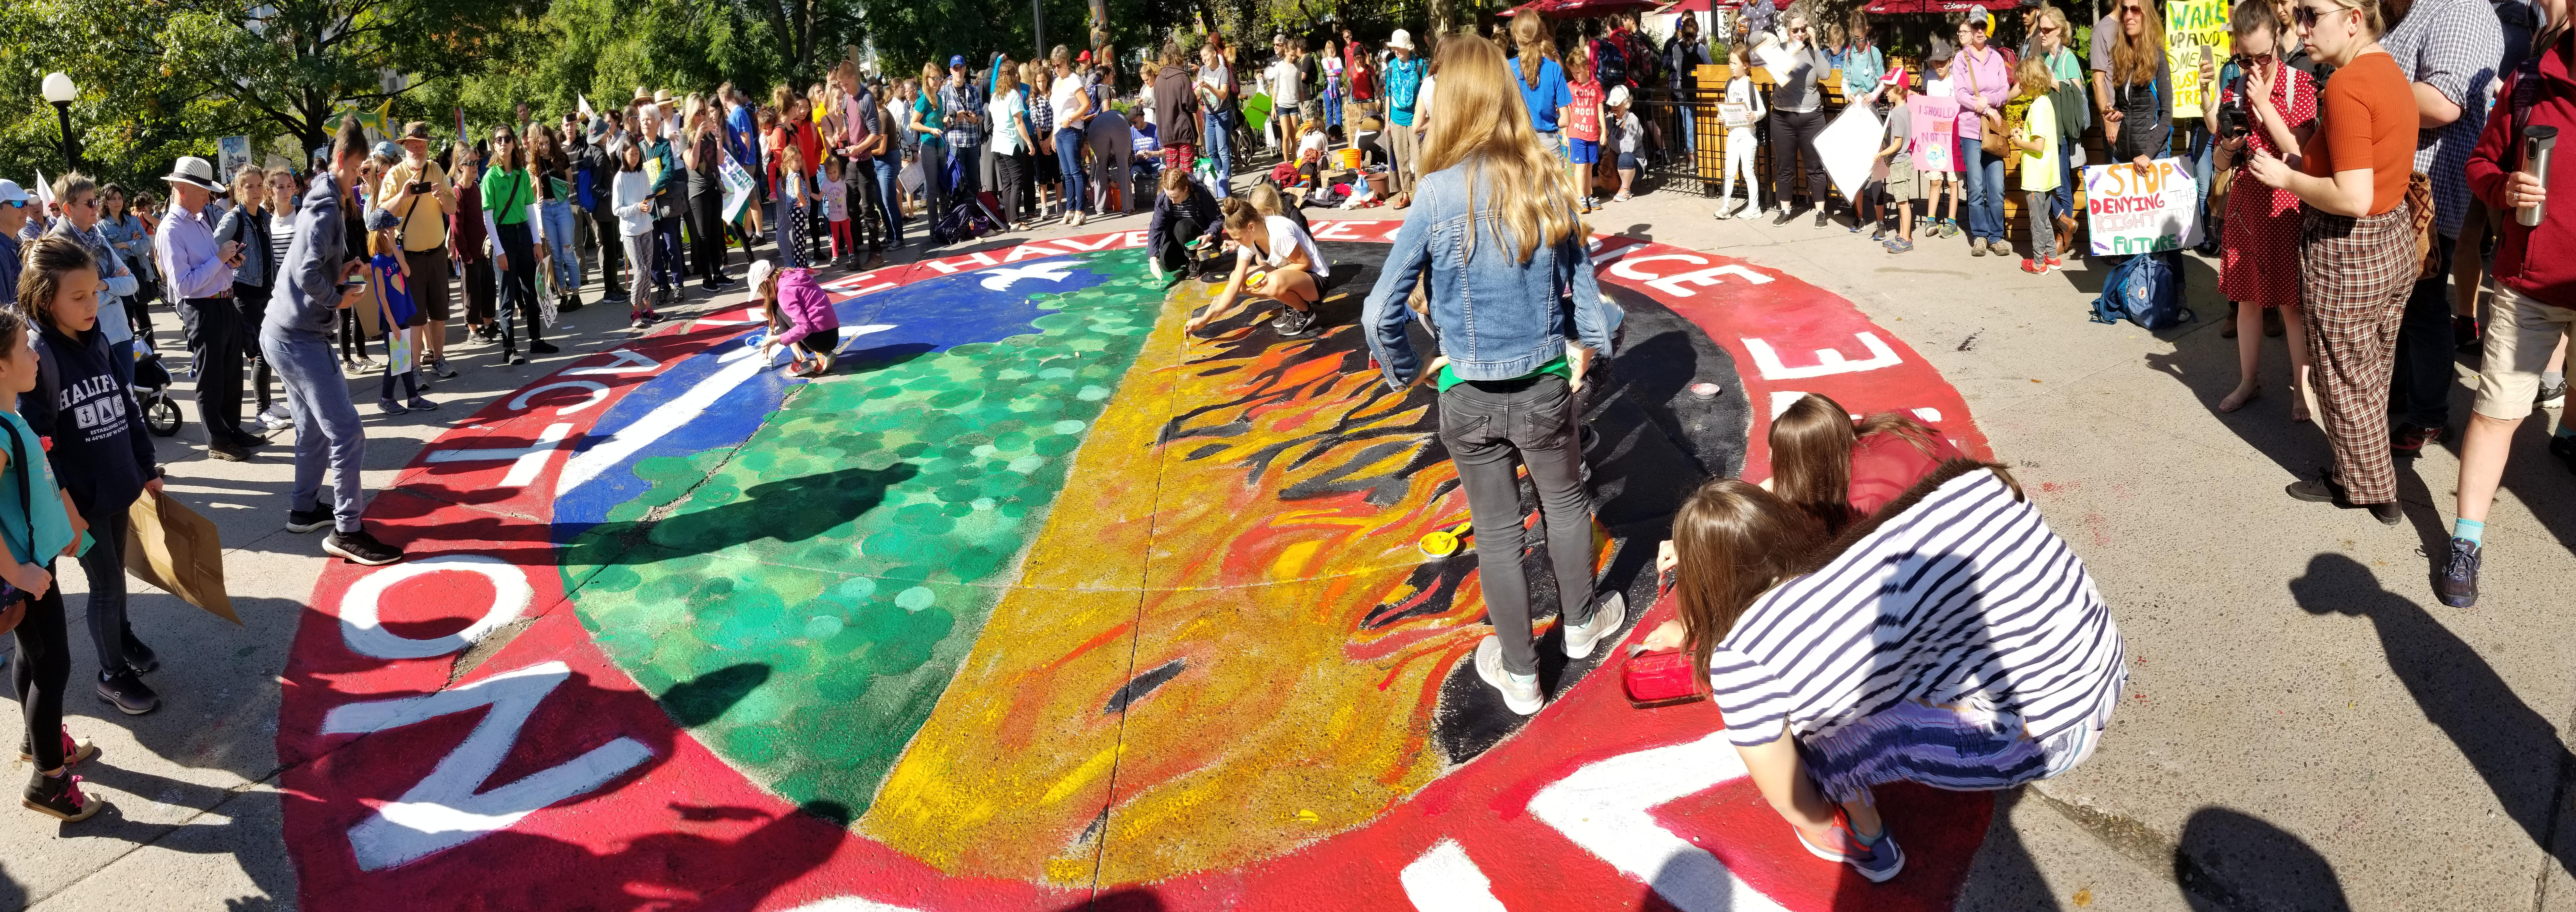 Ottawa street mural at Ottawa climate strike 2019